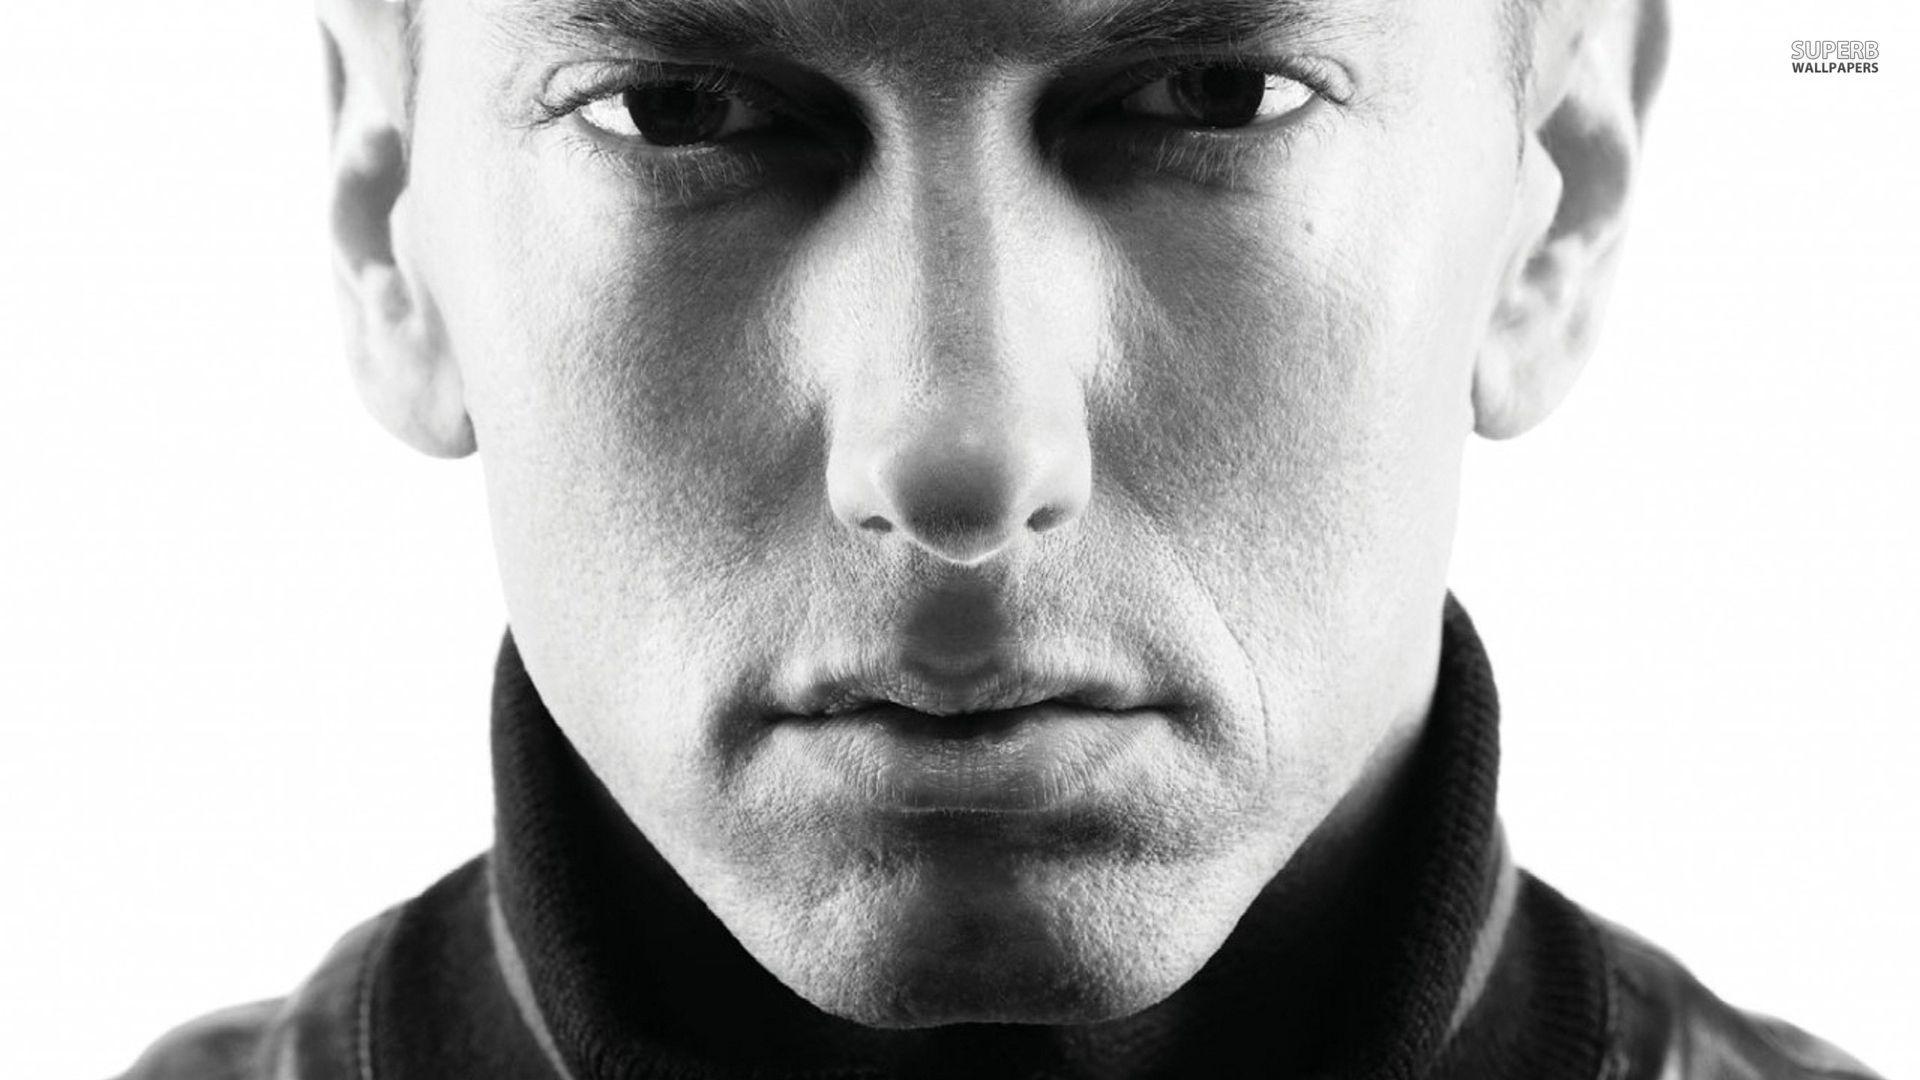 Eminem 1080p Computer Wallpaper People Eminem wallpapers 1920x1080